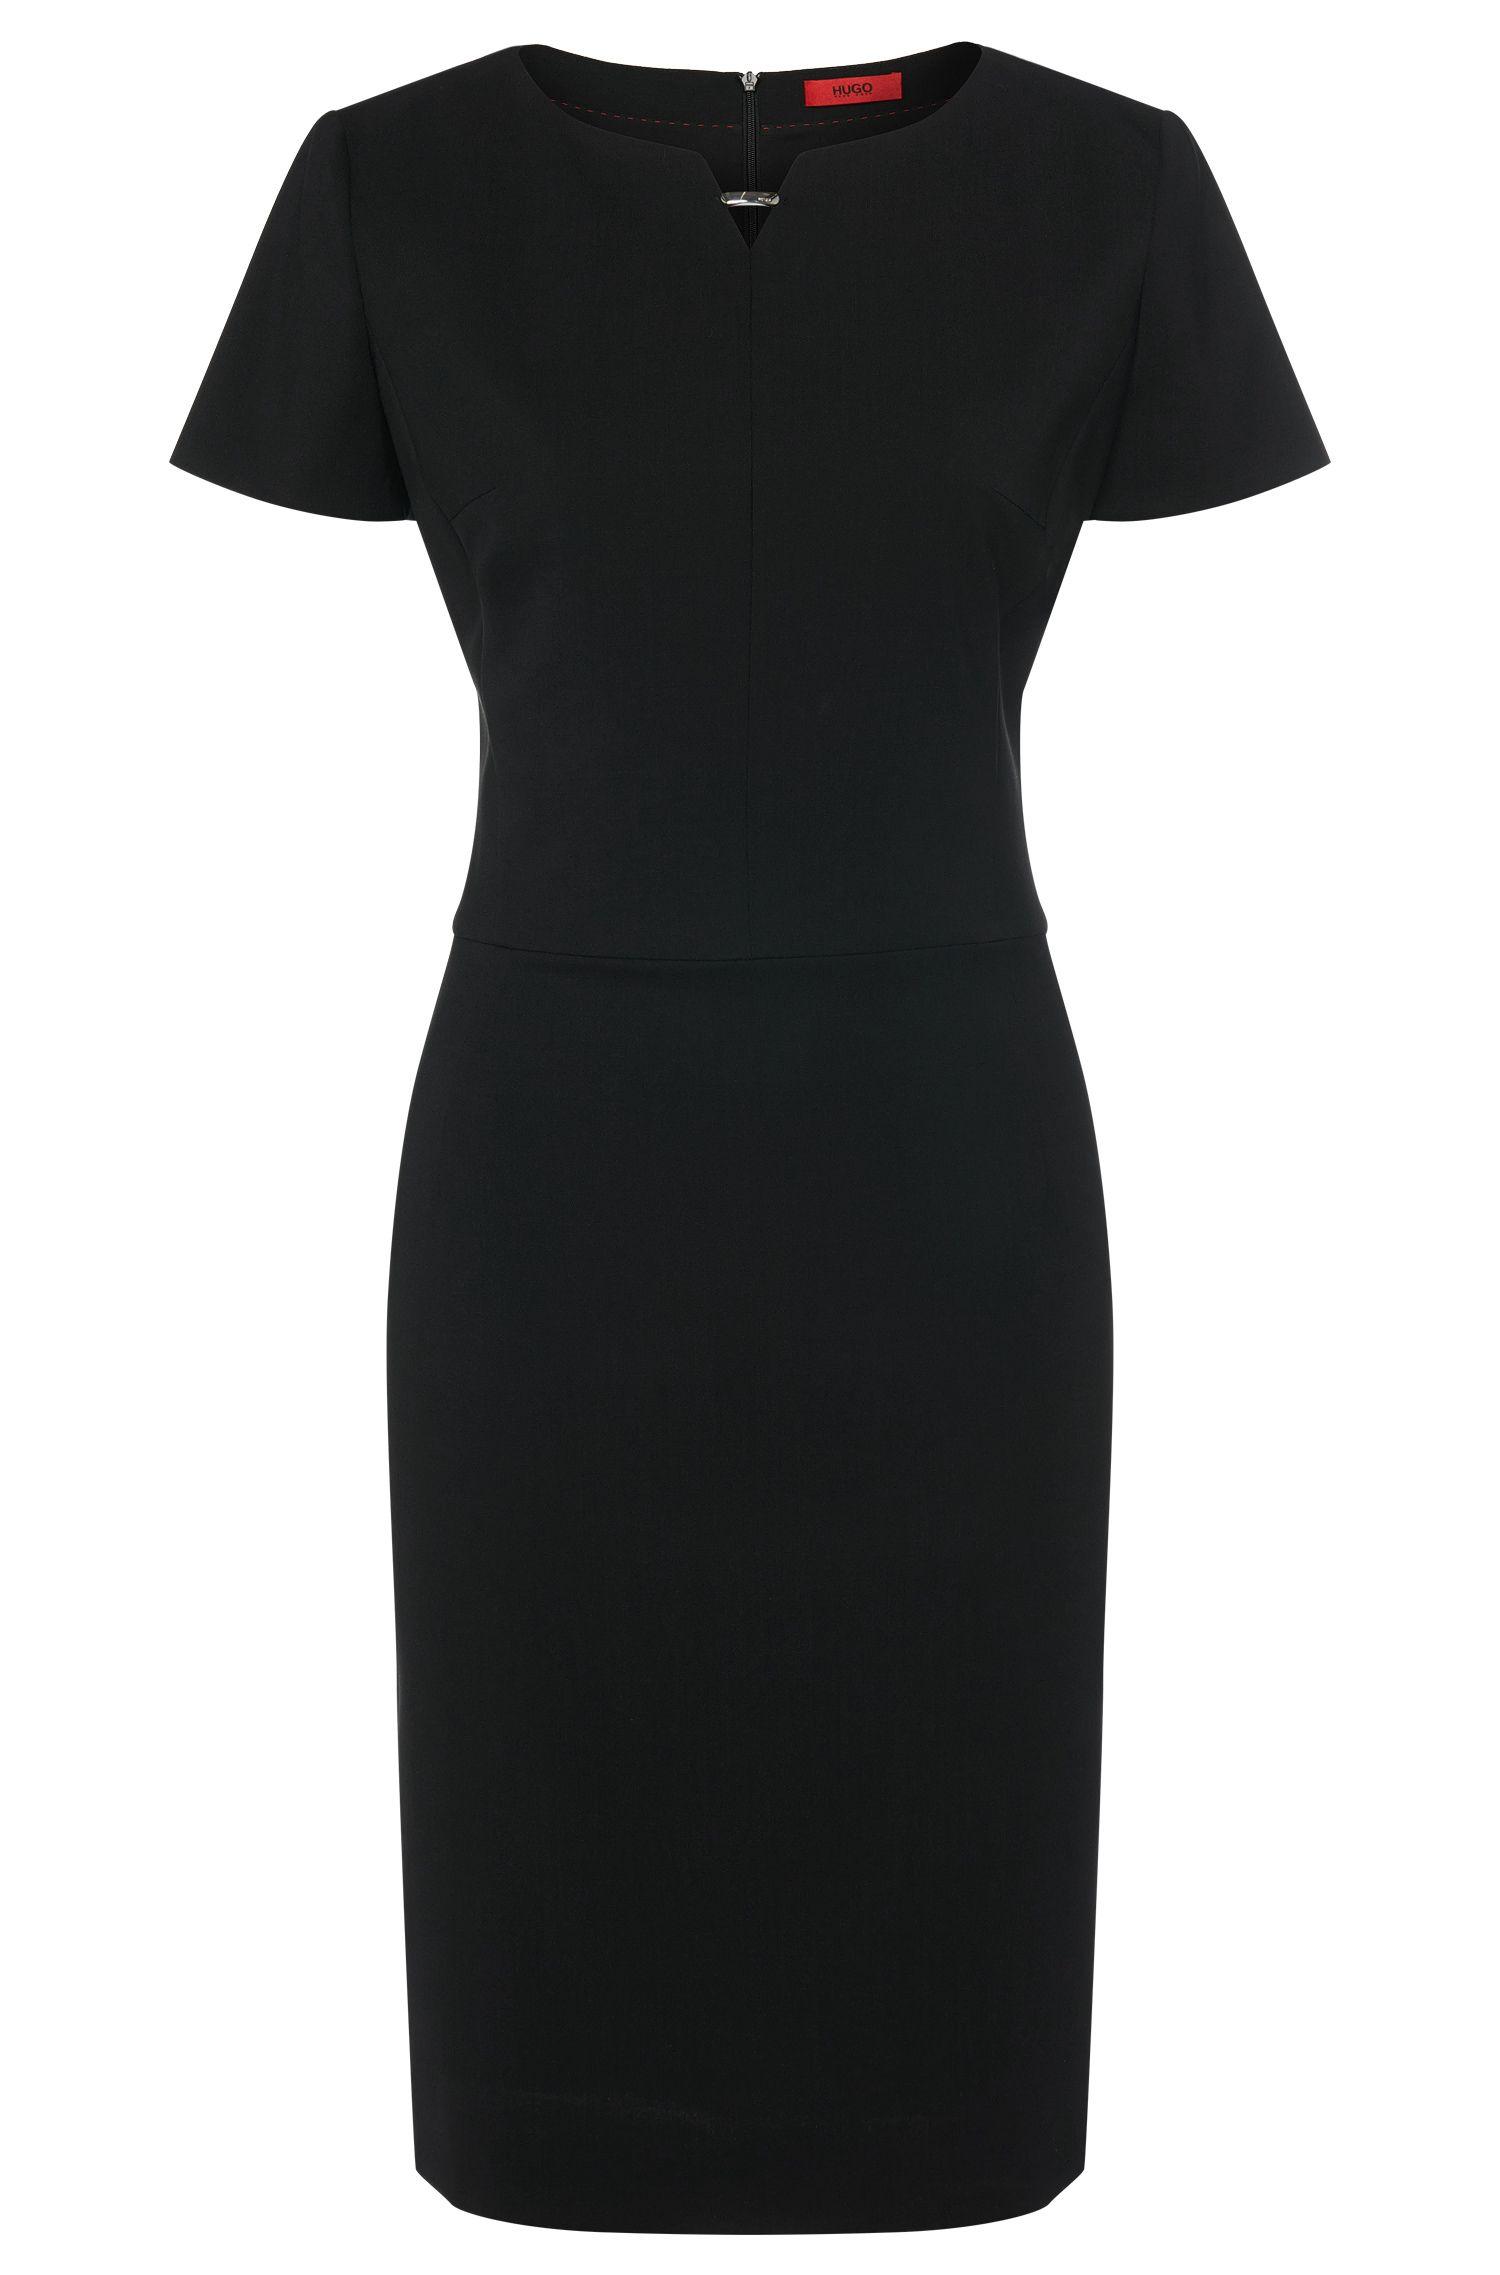 Nauwsluitende jurk van stretchscheerwol met metallic detail:  'Kikos-1'